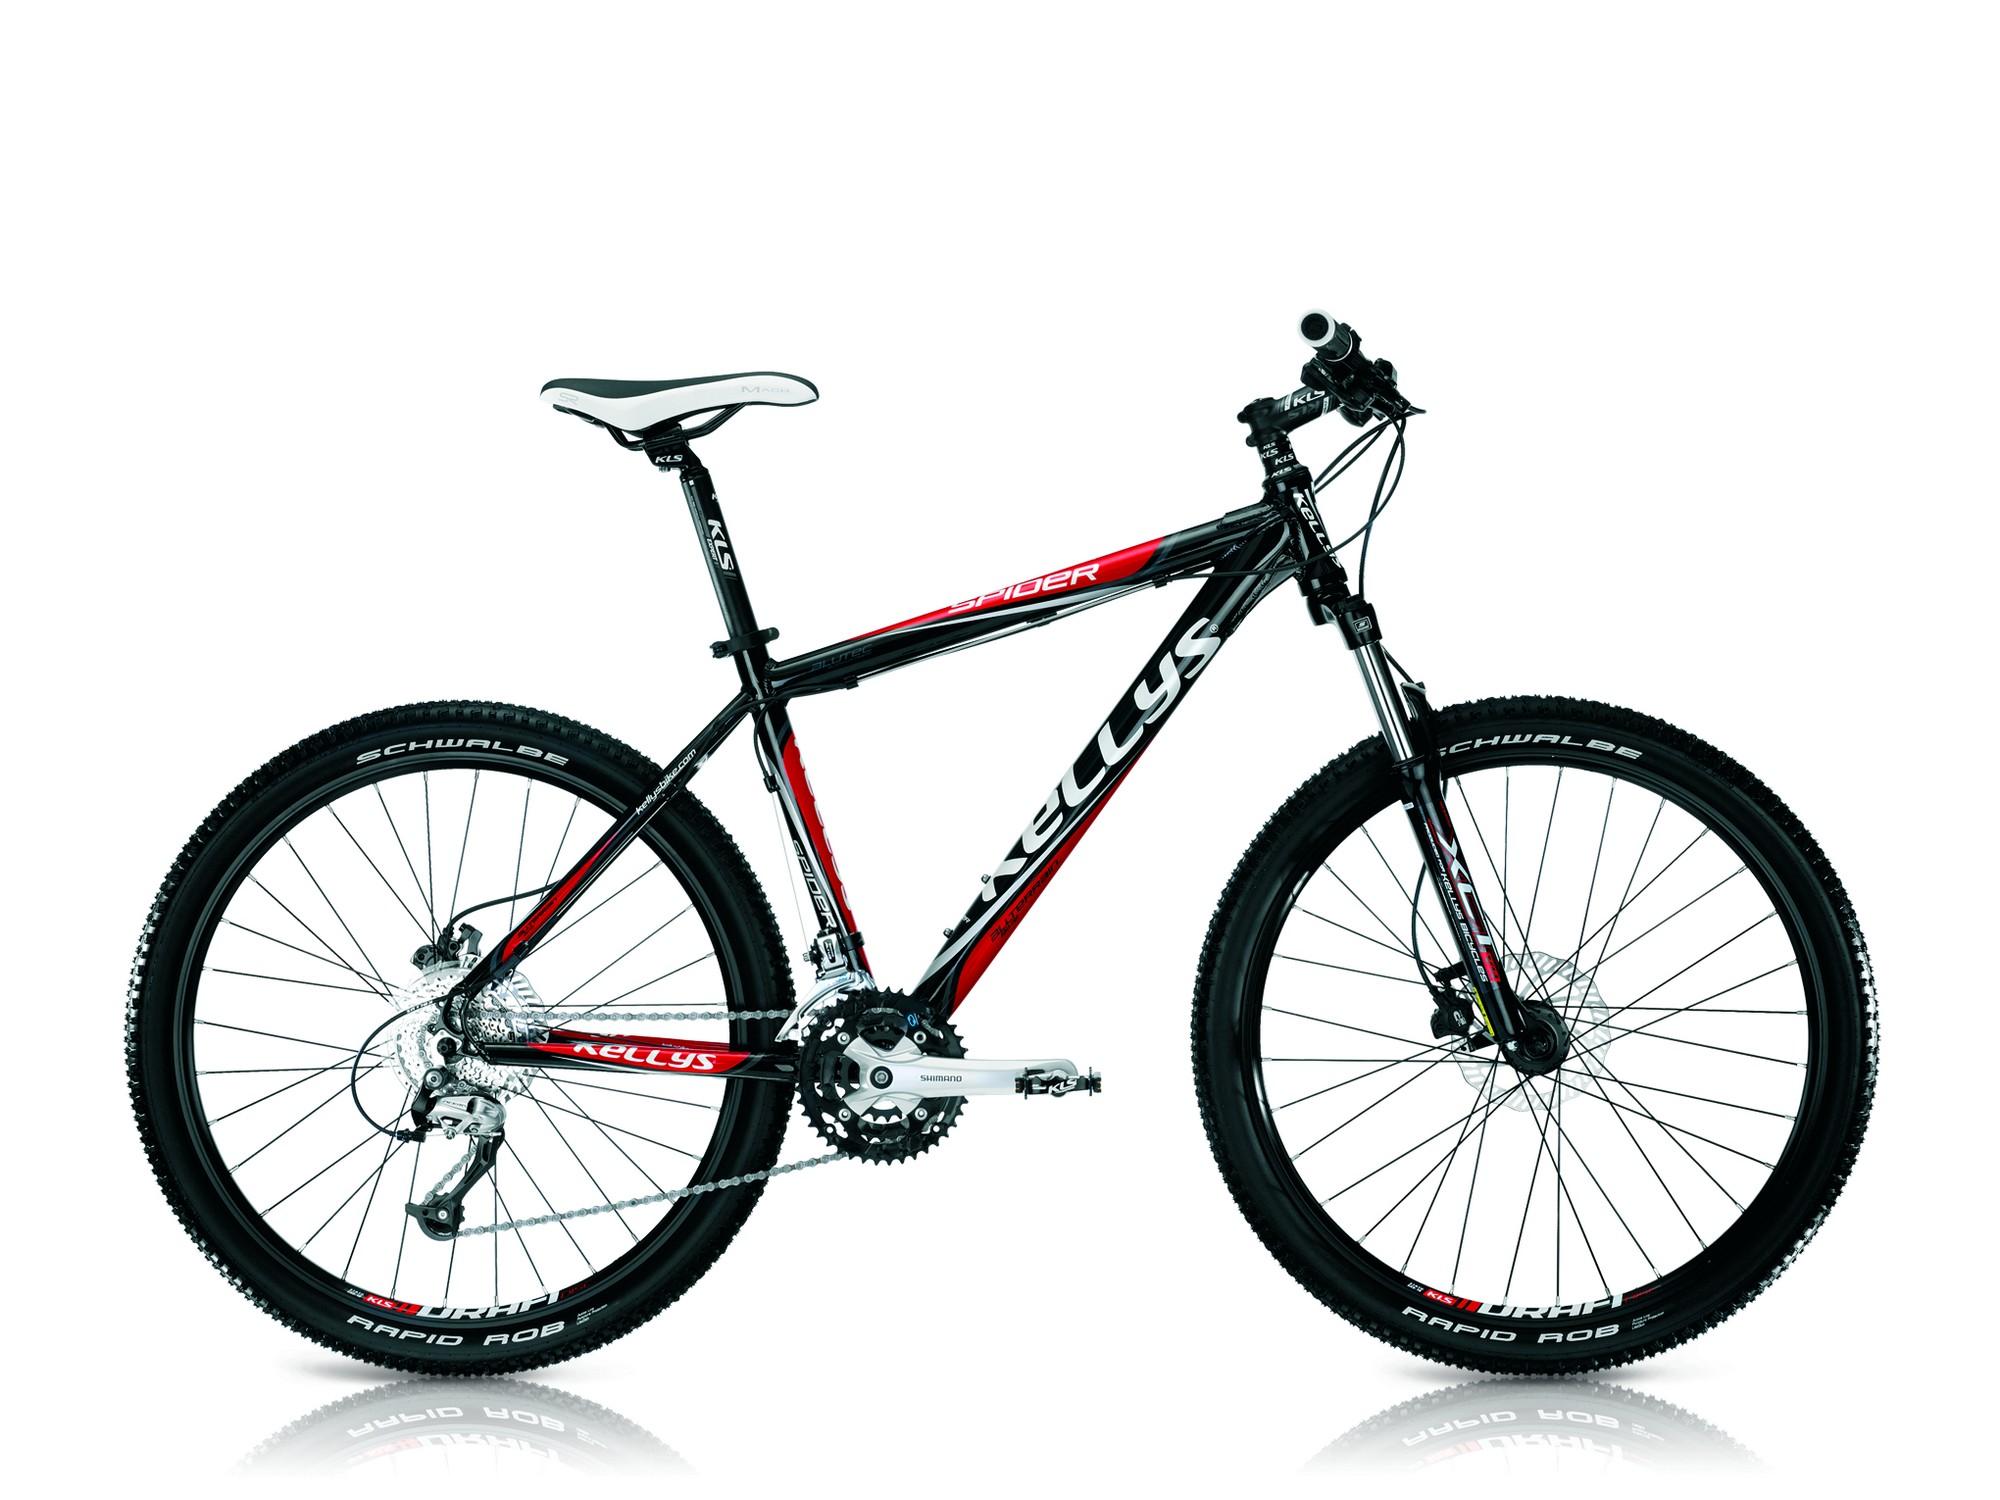 http://www.kellys.com.ua/bikes/2012/2012Kellys_SPIDER_BLACK.jpg